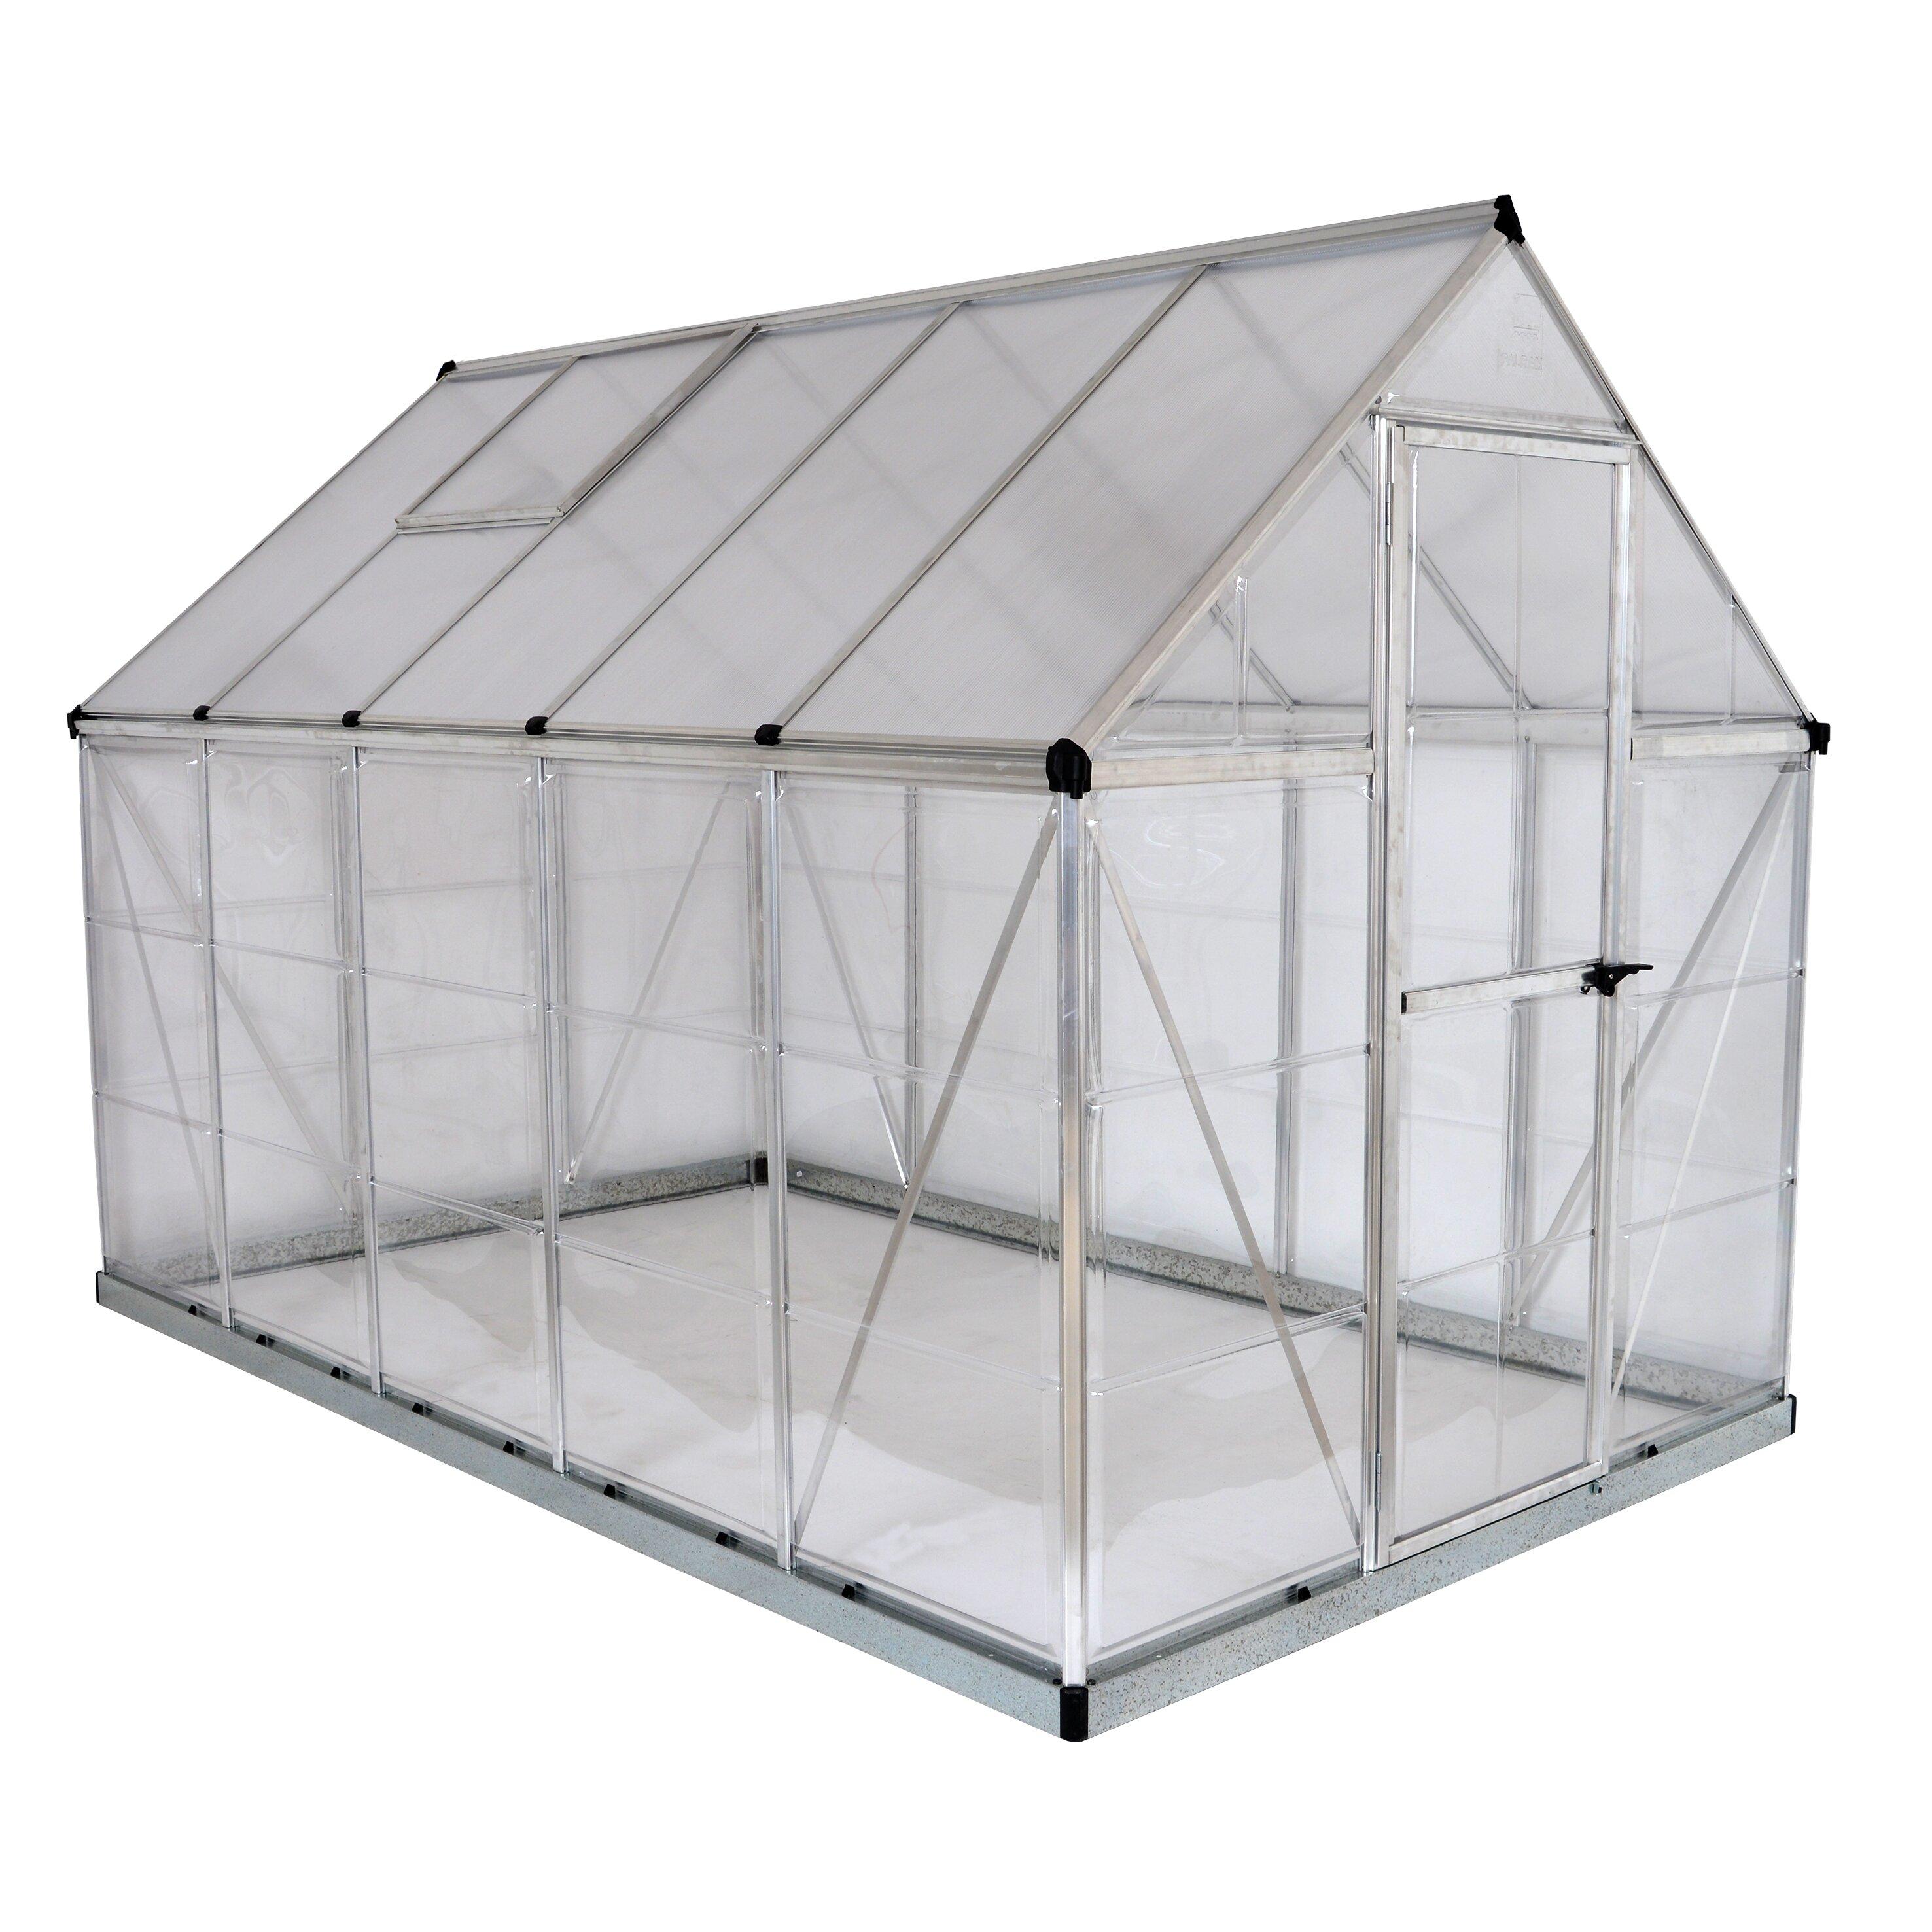 Palram Hybrid 6 Ft. W X 10 Ft. D Cold Frame Greenhouse